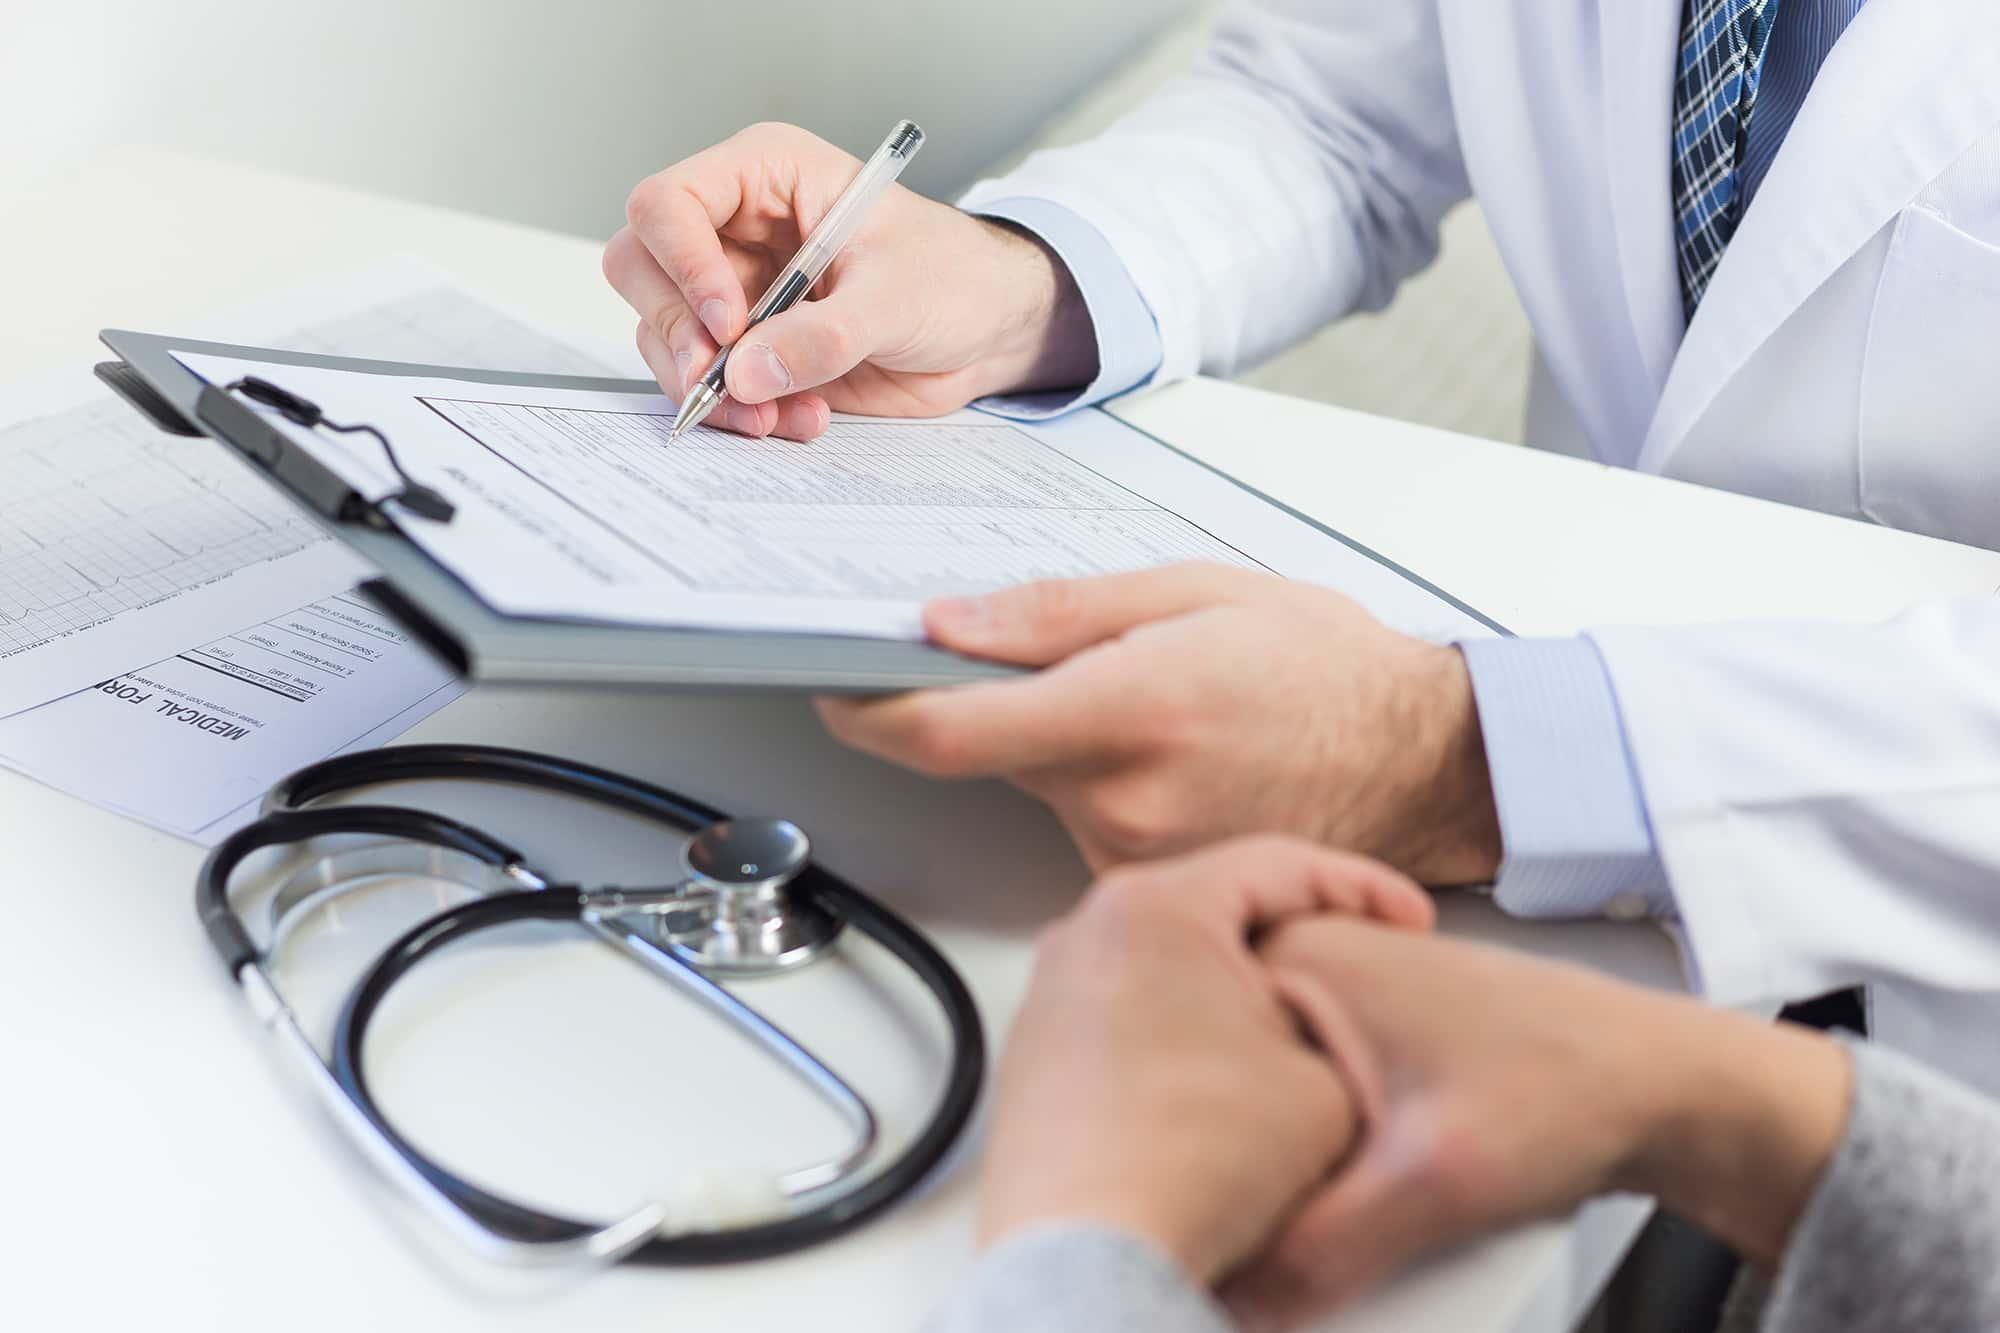 Ritiro di referti medici ed analisi